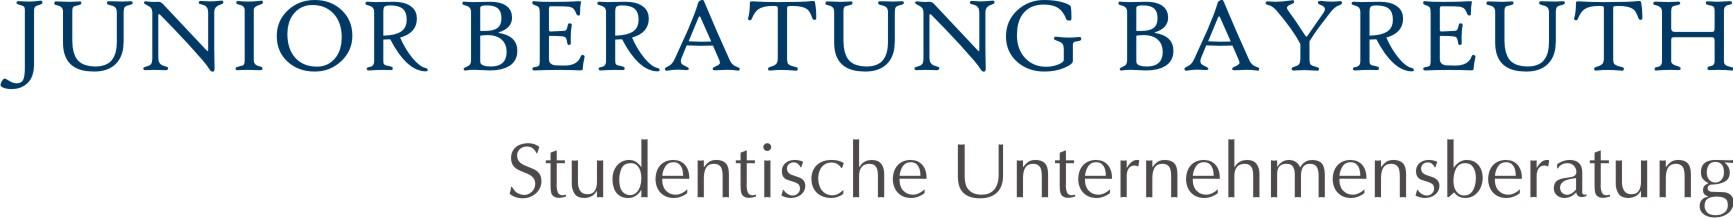 Junior Beratung Bayreuth e. V.